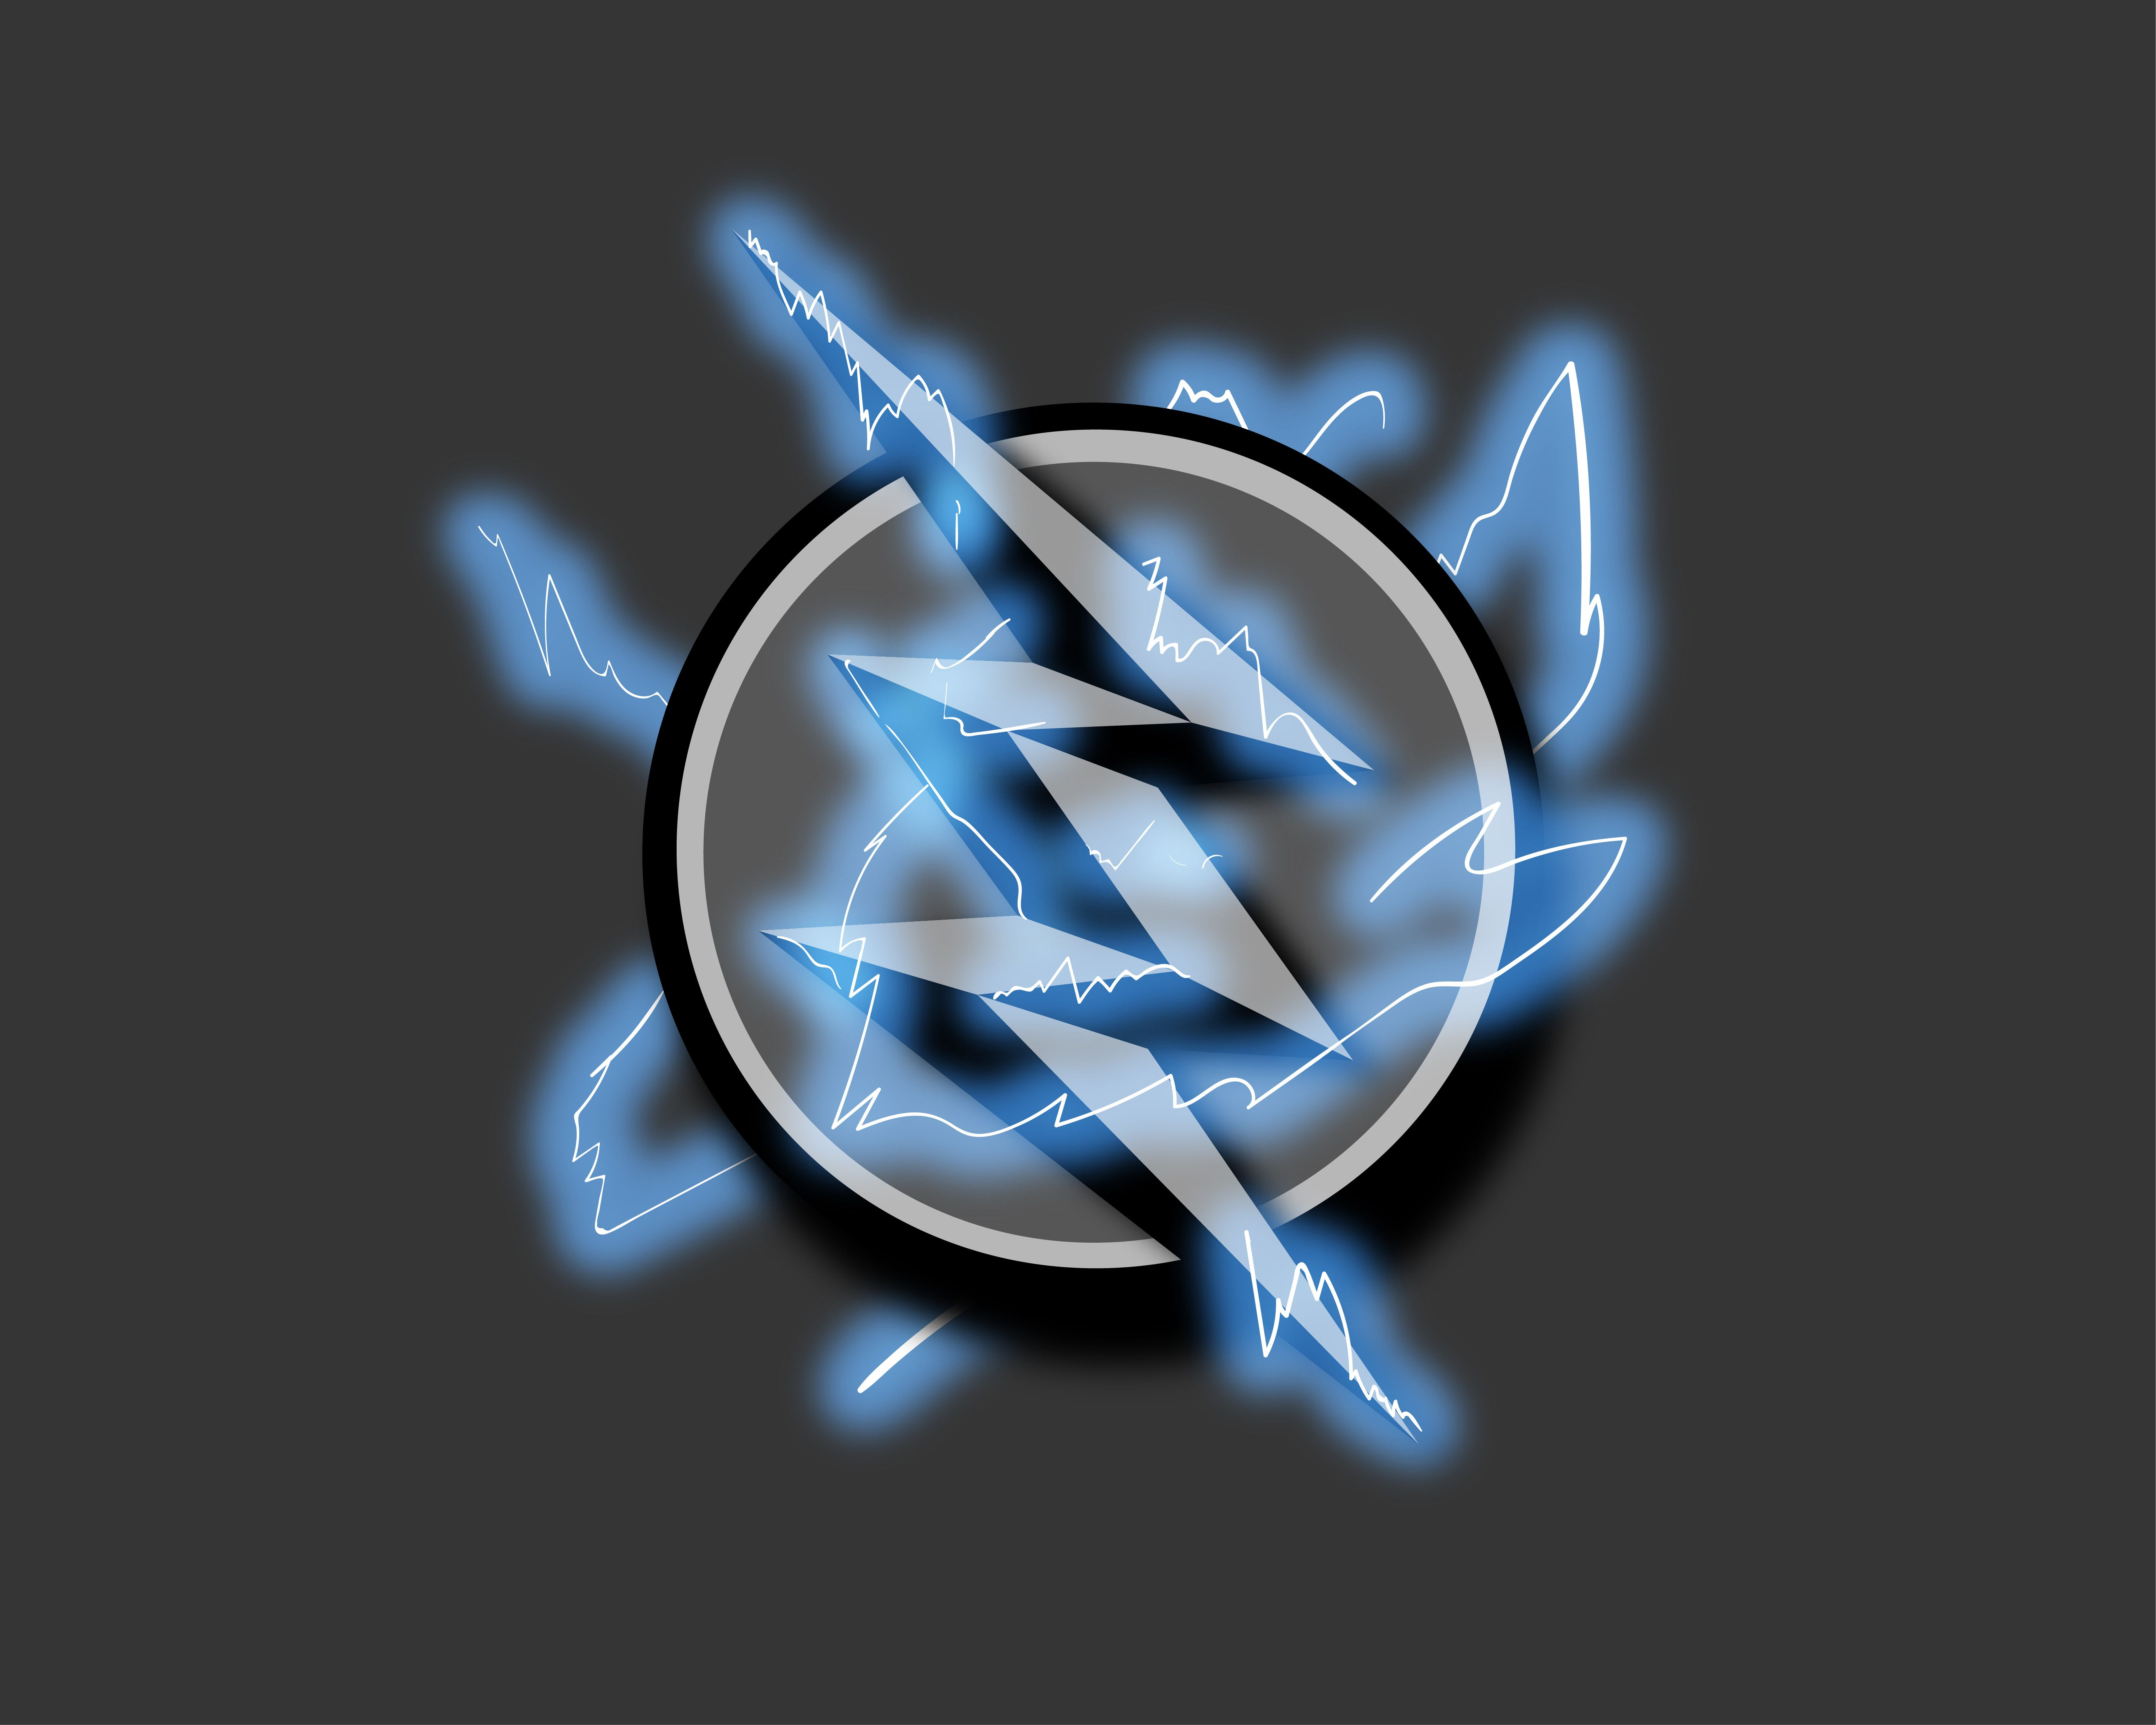 the flash zoom logo ediits the flash savage